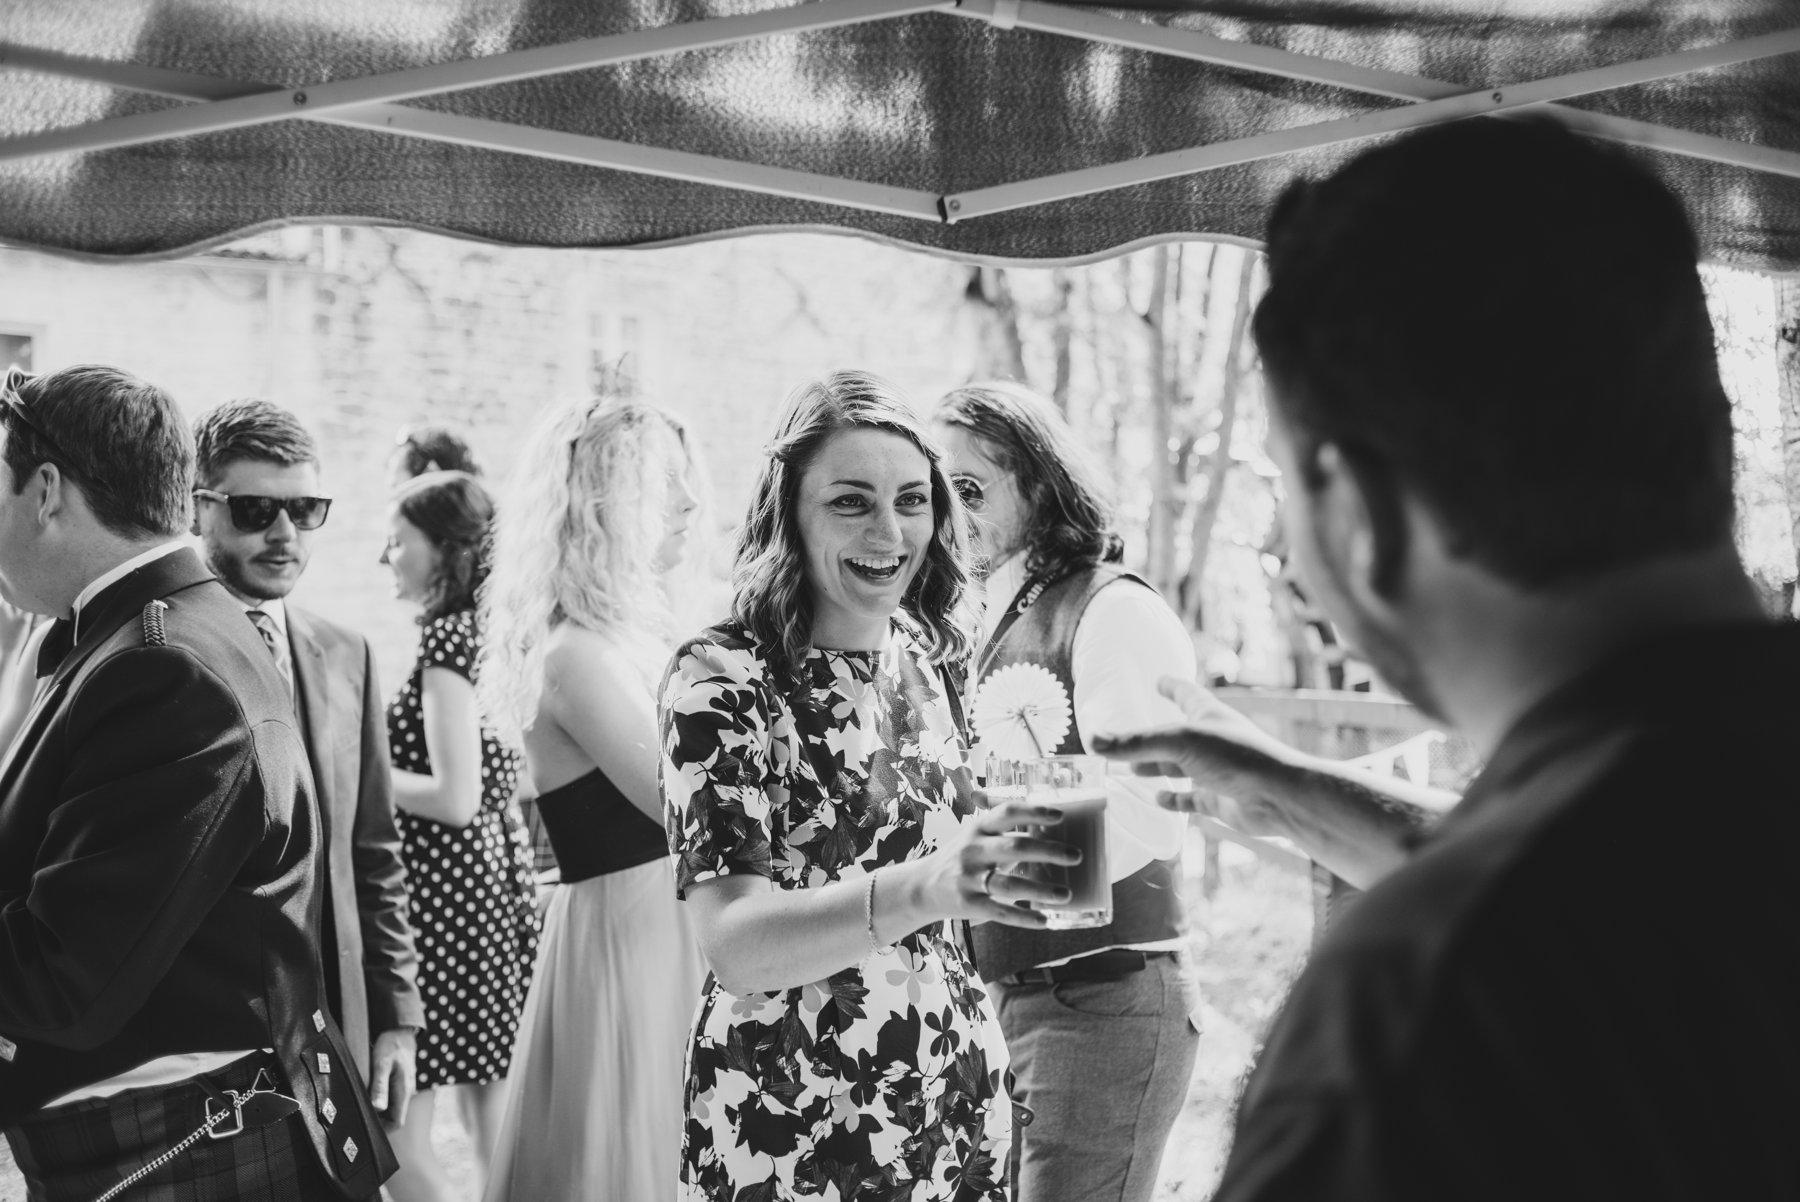 petitmoulin_france_bordeaux_weddings_0060